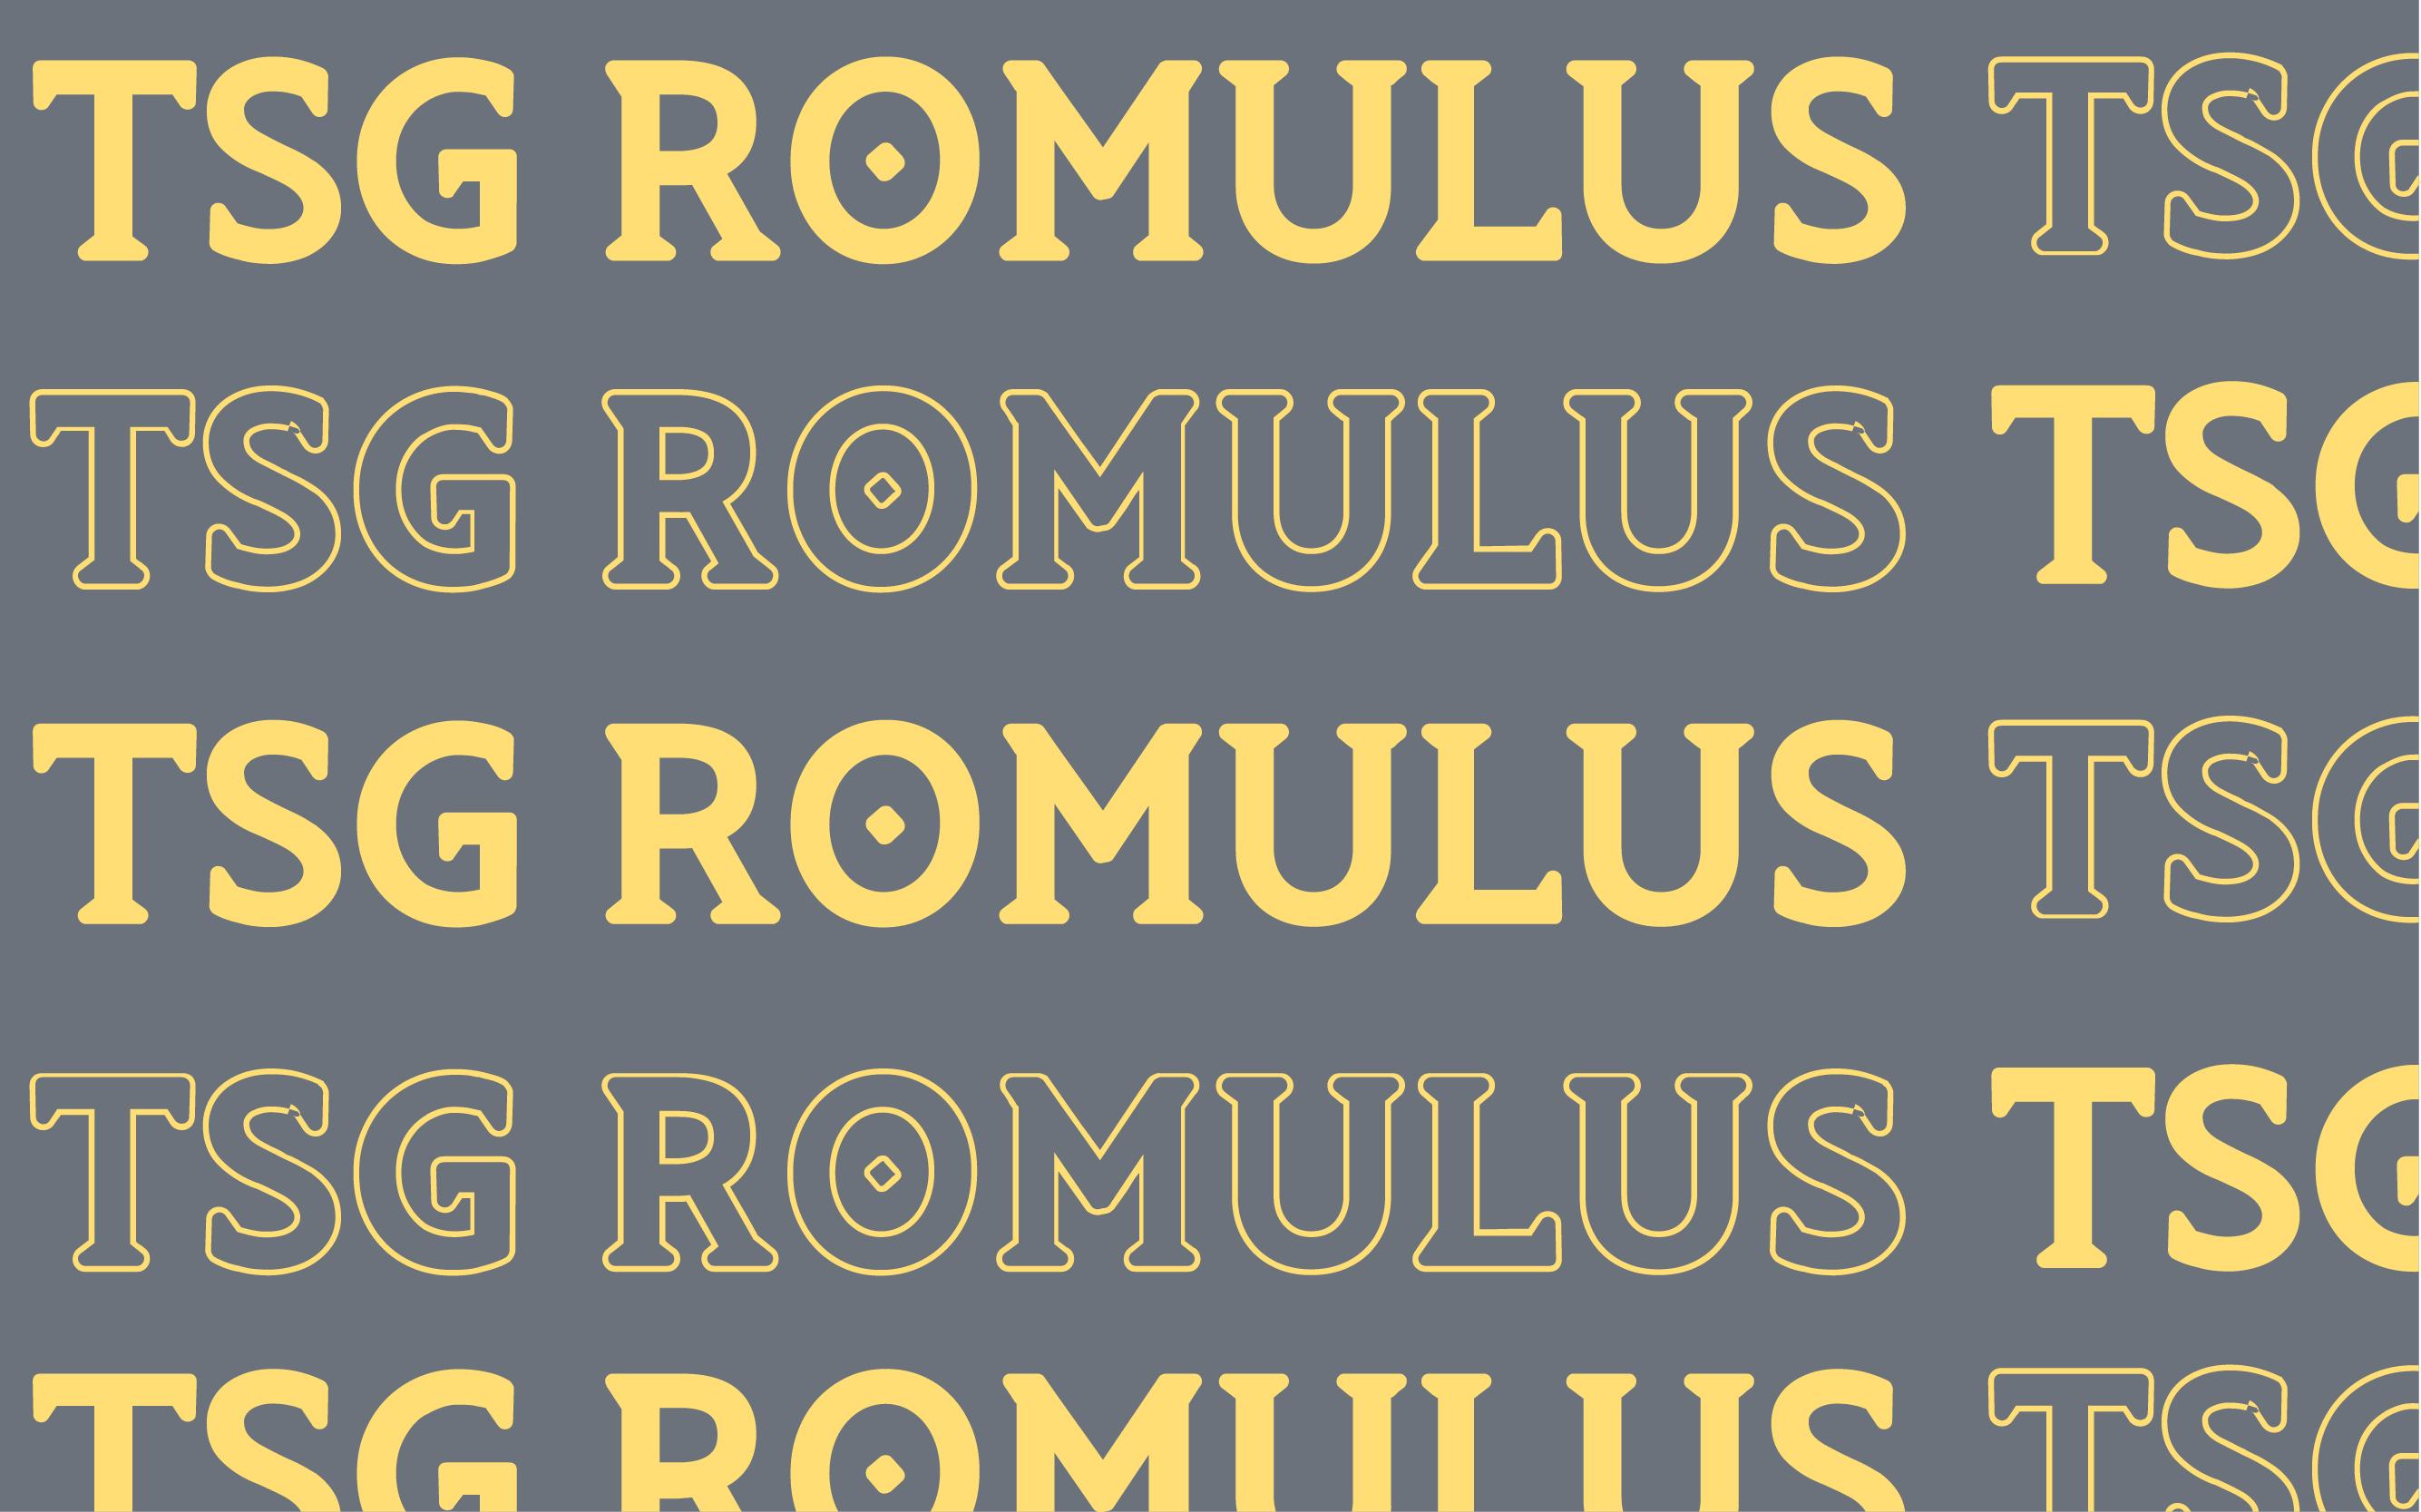 TSG Romulus